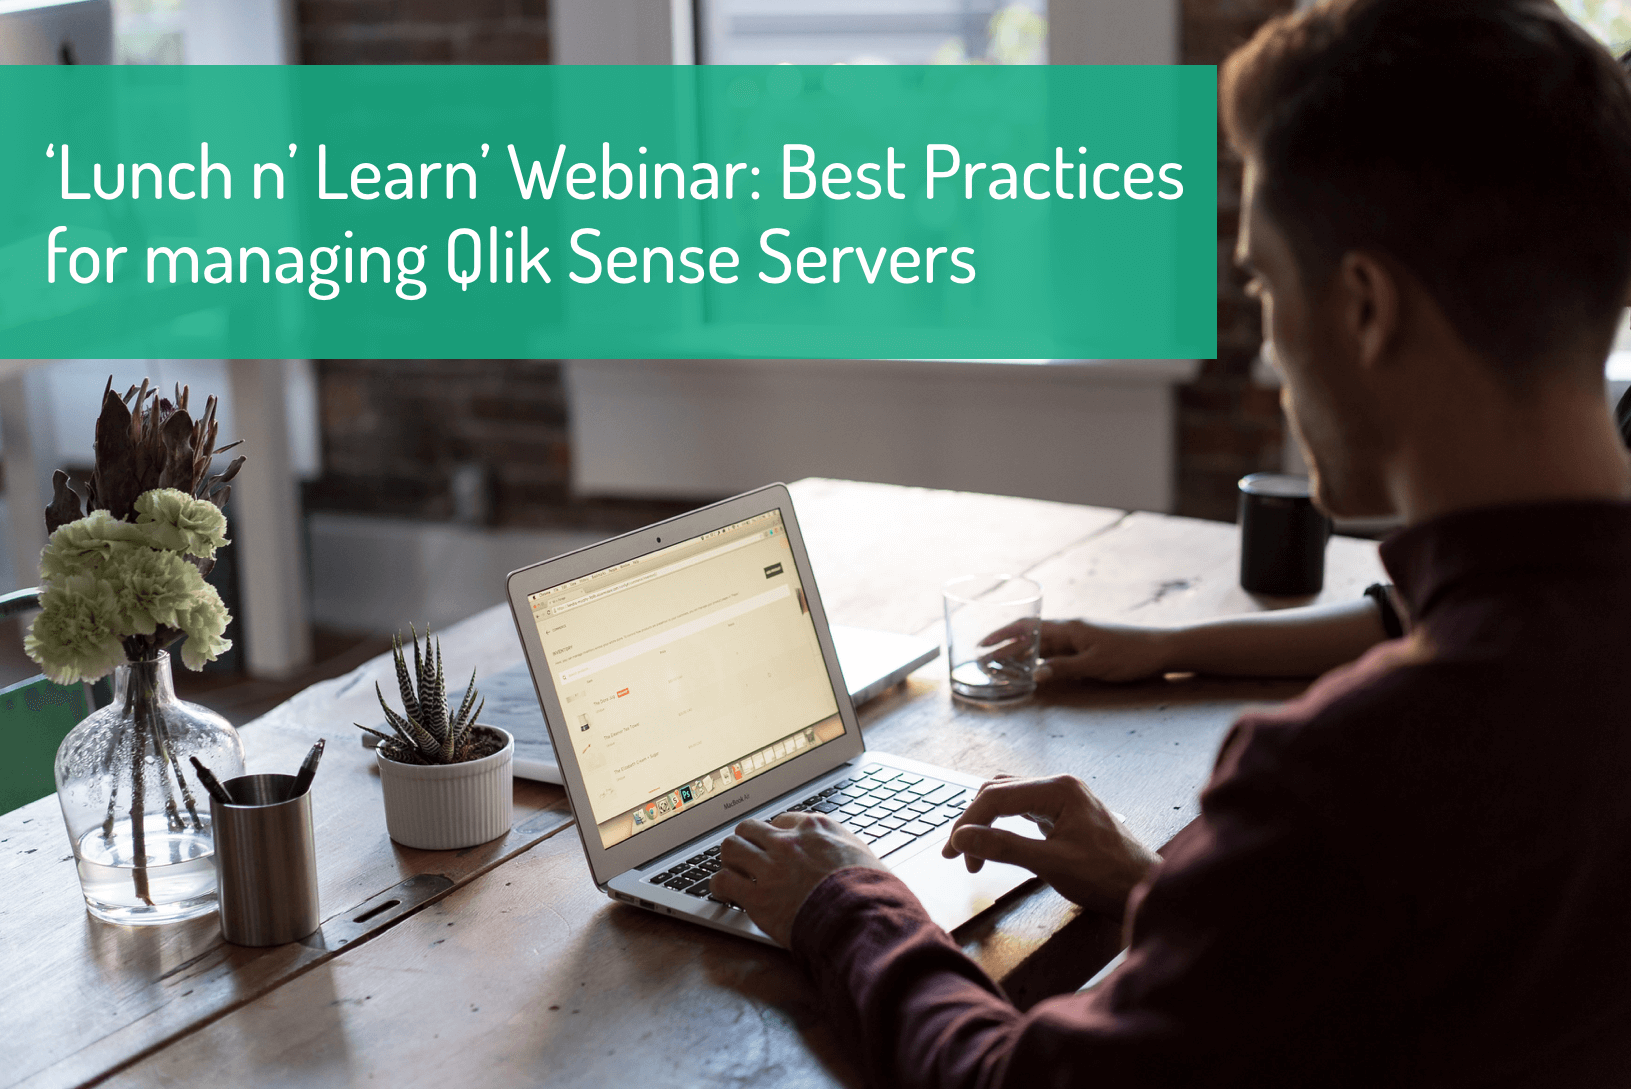 7 AUGUST 2019: Lunch n Learn Webinar: Best Practices for managing Qlik Sense Server